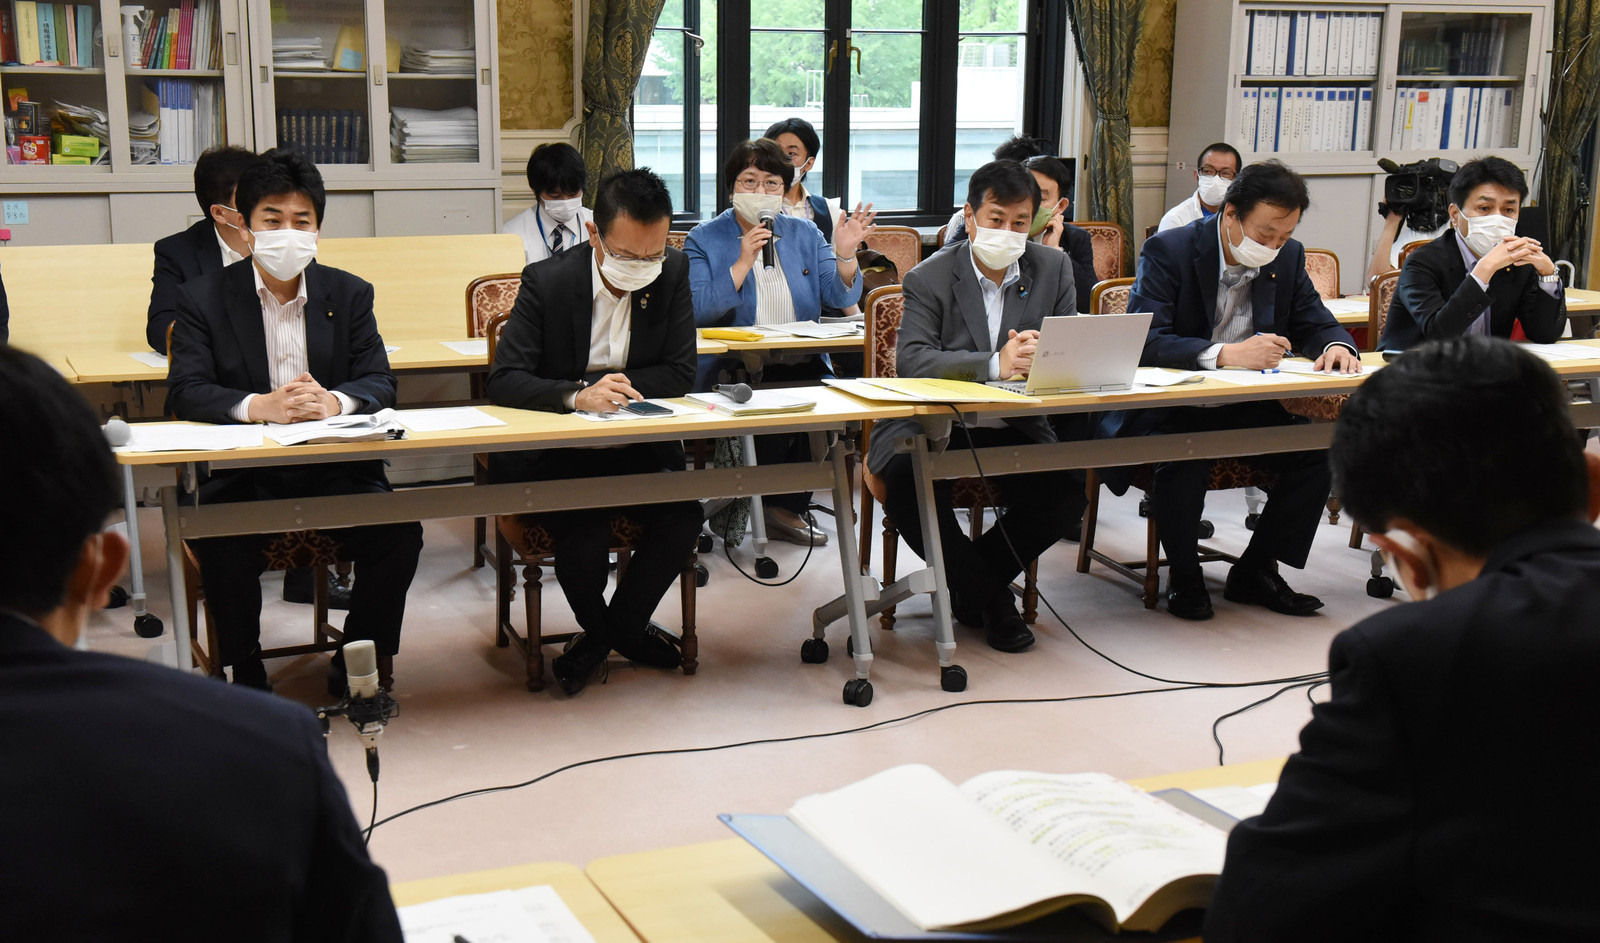 GoToキャンペーン・持続化給付金問題をめぐる野党合同ヒアリングで発言する高橋千鶴子衆院議員